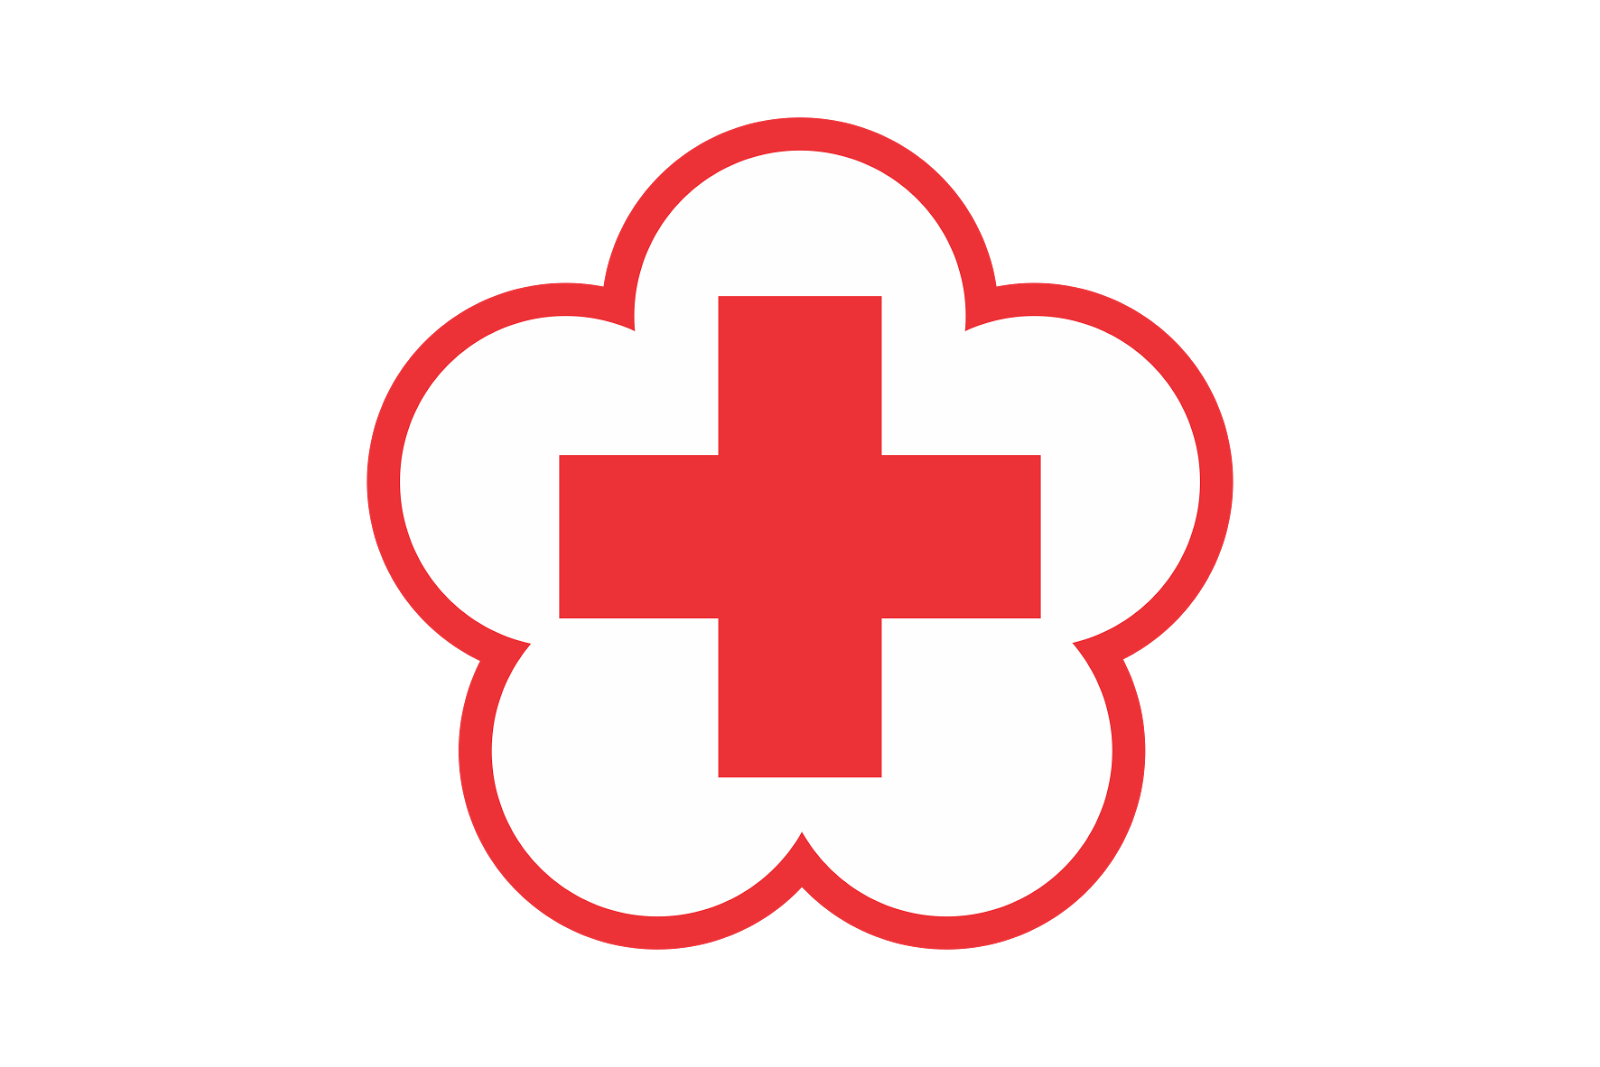 Palang Merah Indonesia Logo.